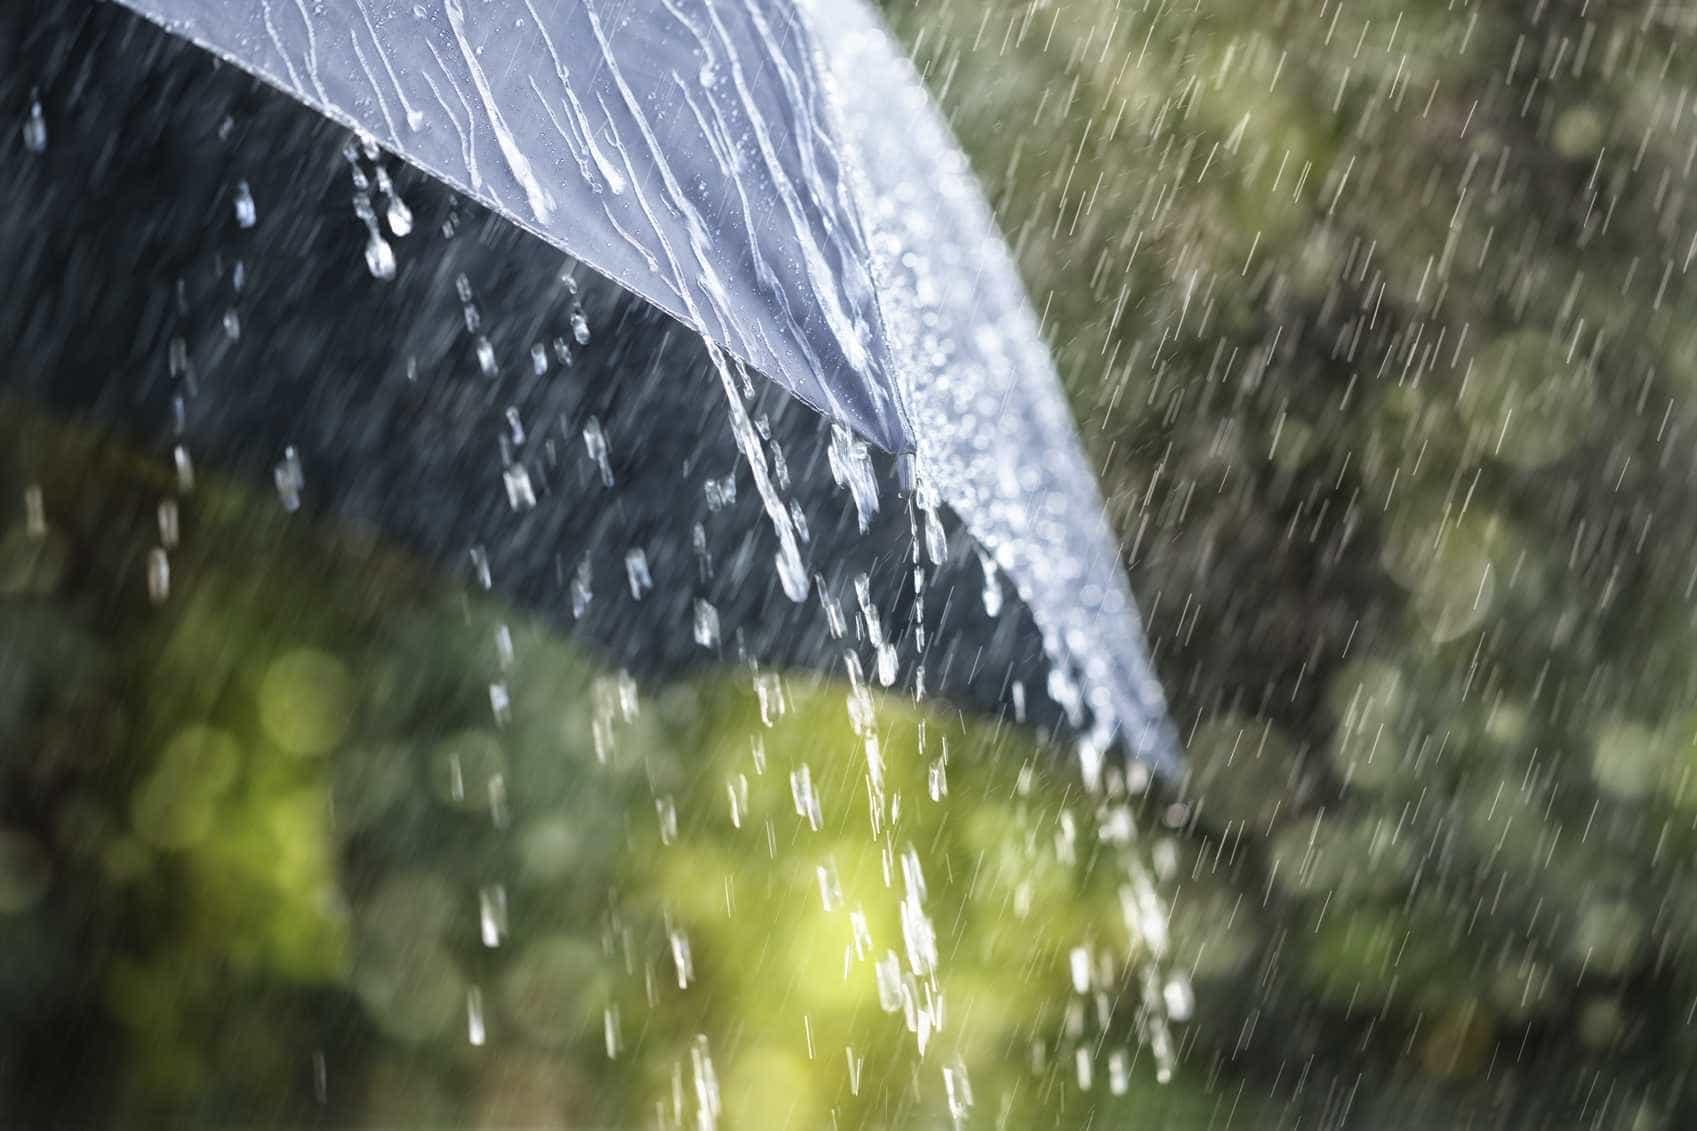 Chuva está de volta, com granizo e trovoadas. Oito distritos sob aviso